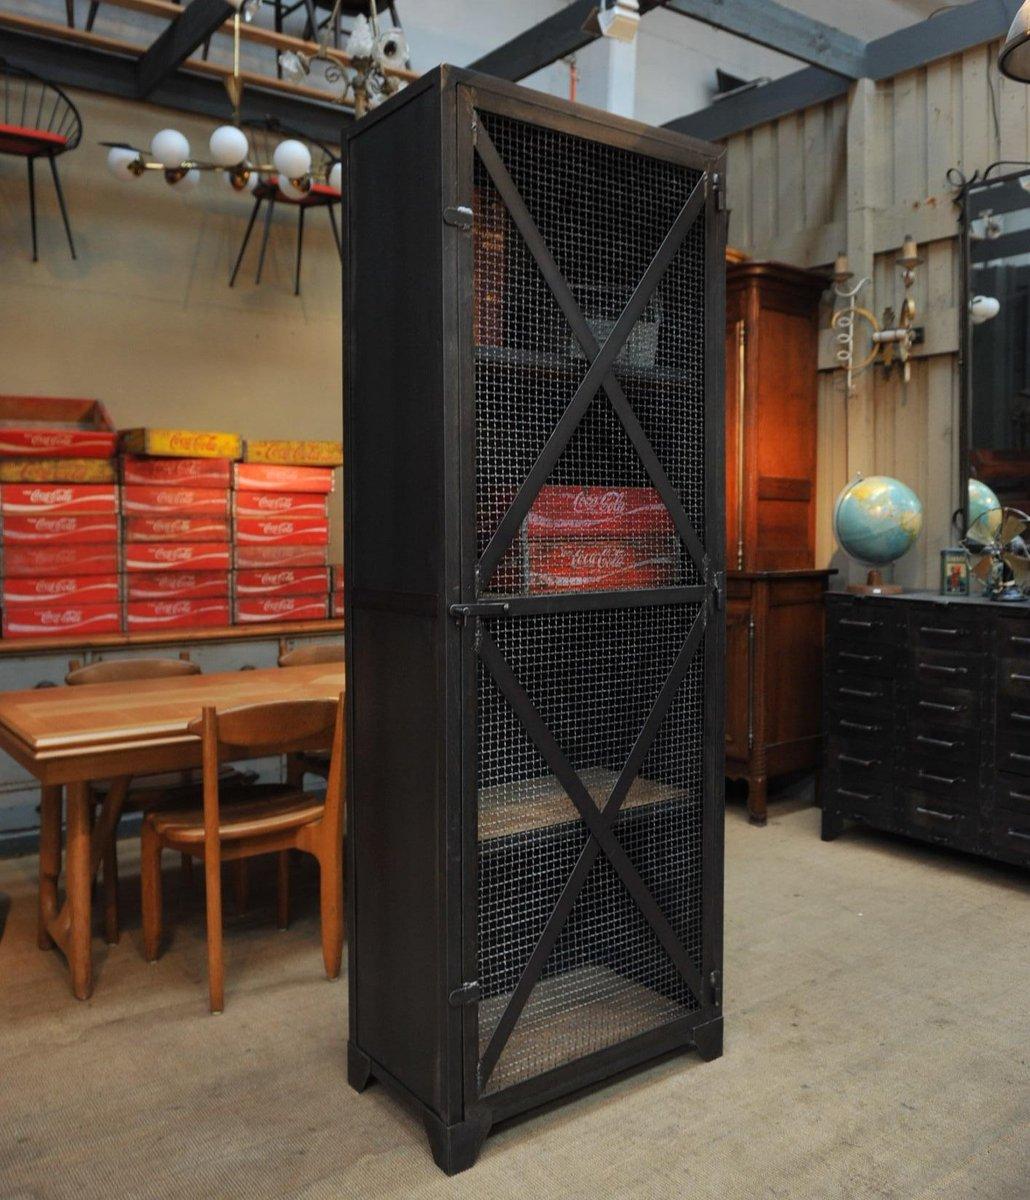 grillage pour meuble best vaisselier with grillage pour meuble free ou trouver du grillage a. Black Bedroom Furniture Sets. Home Design Ideas